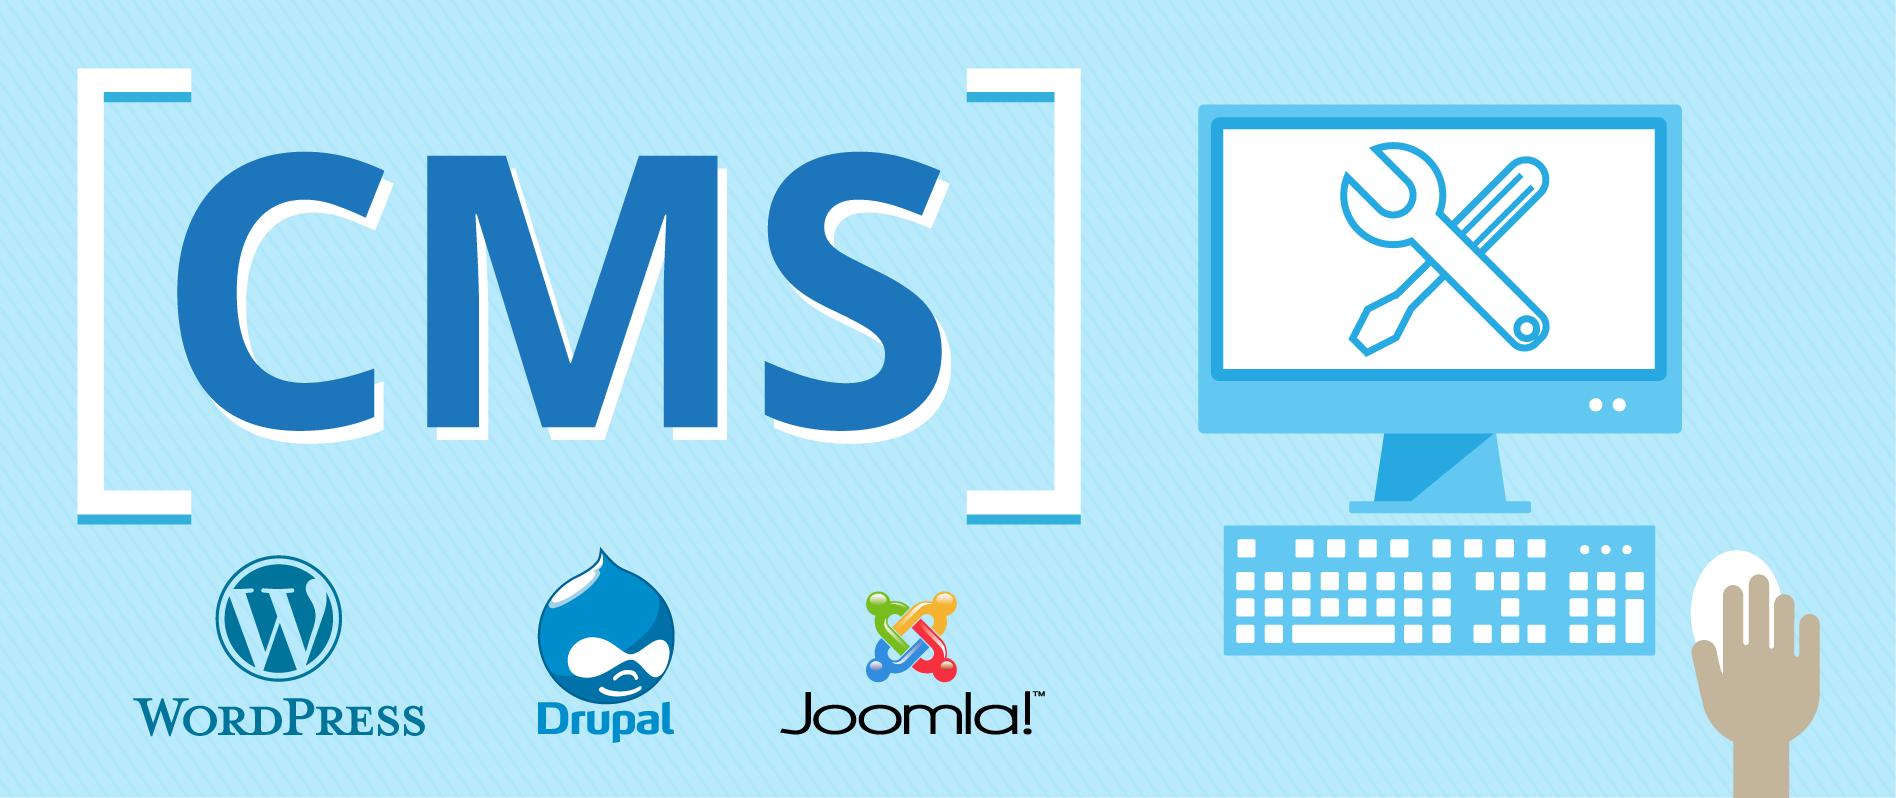 Joomla the best Content Management System CMS